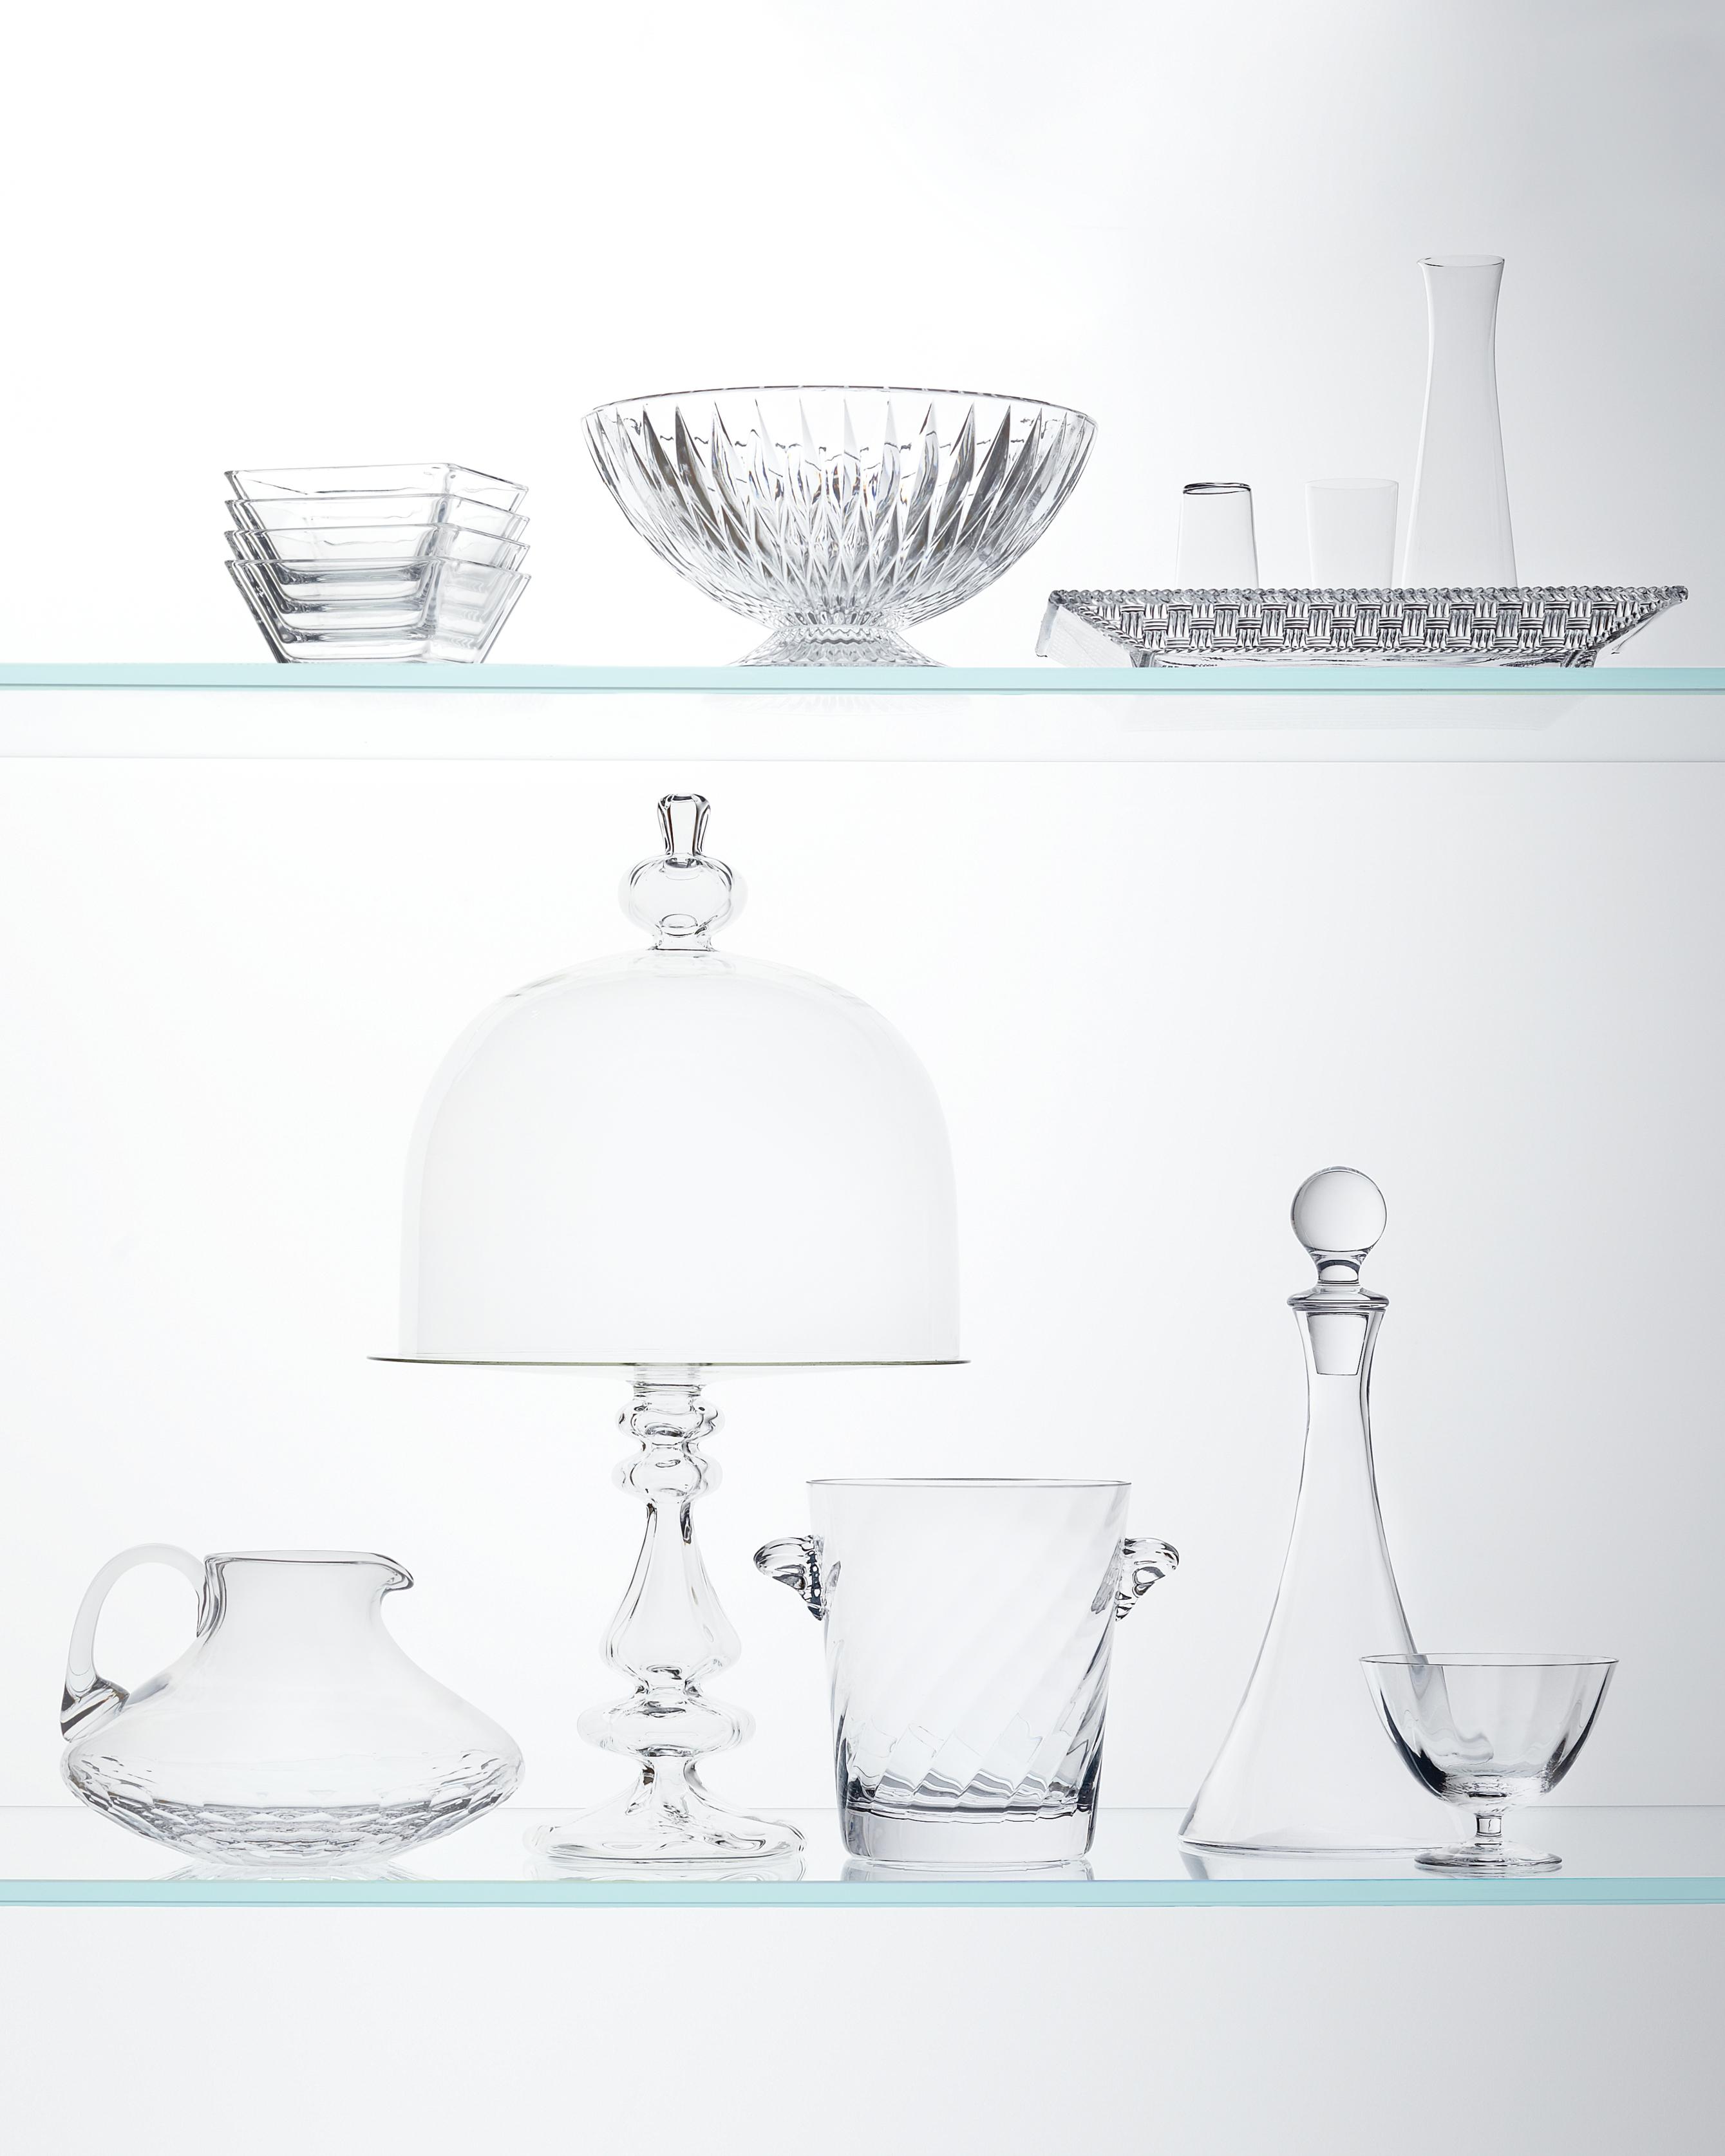 glass-entertain-mwd109328.jpg